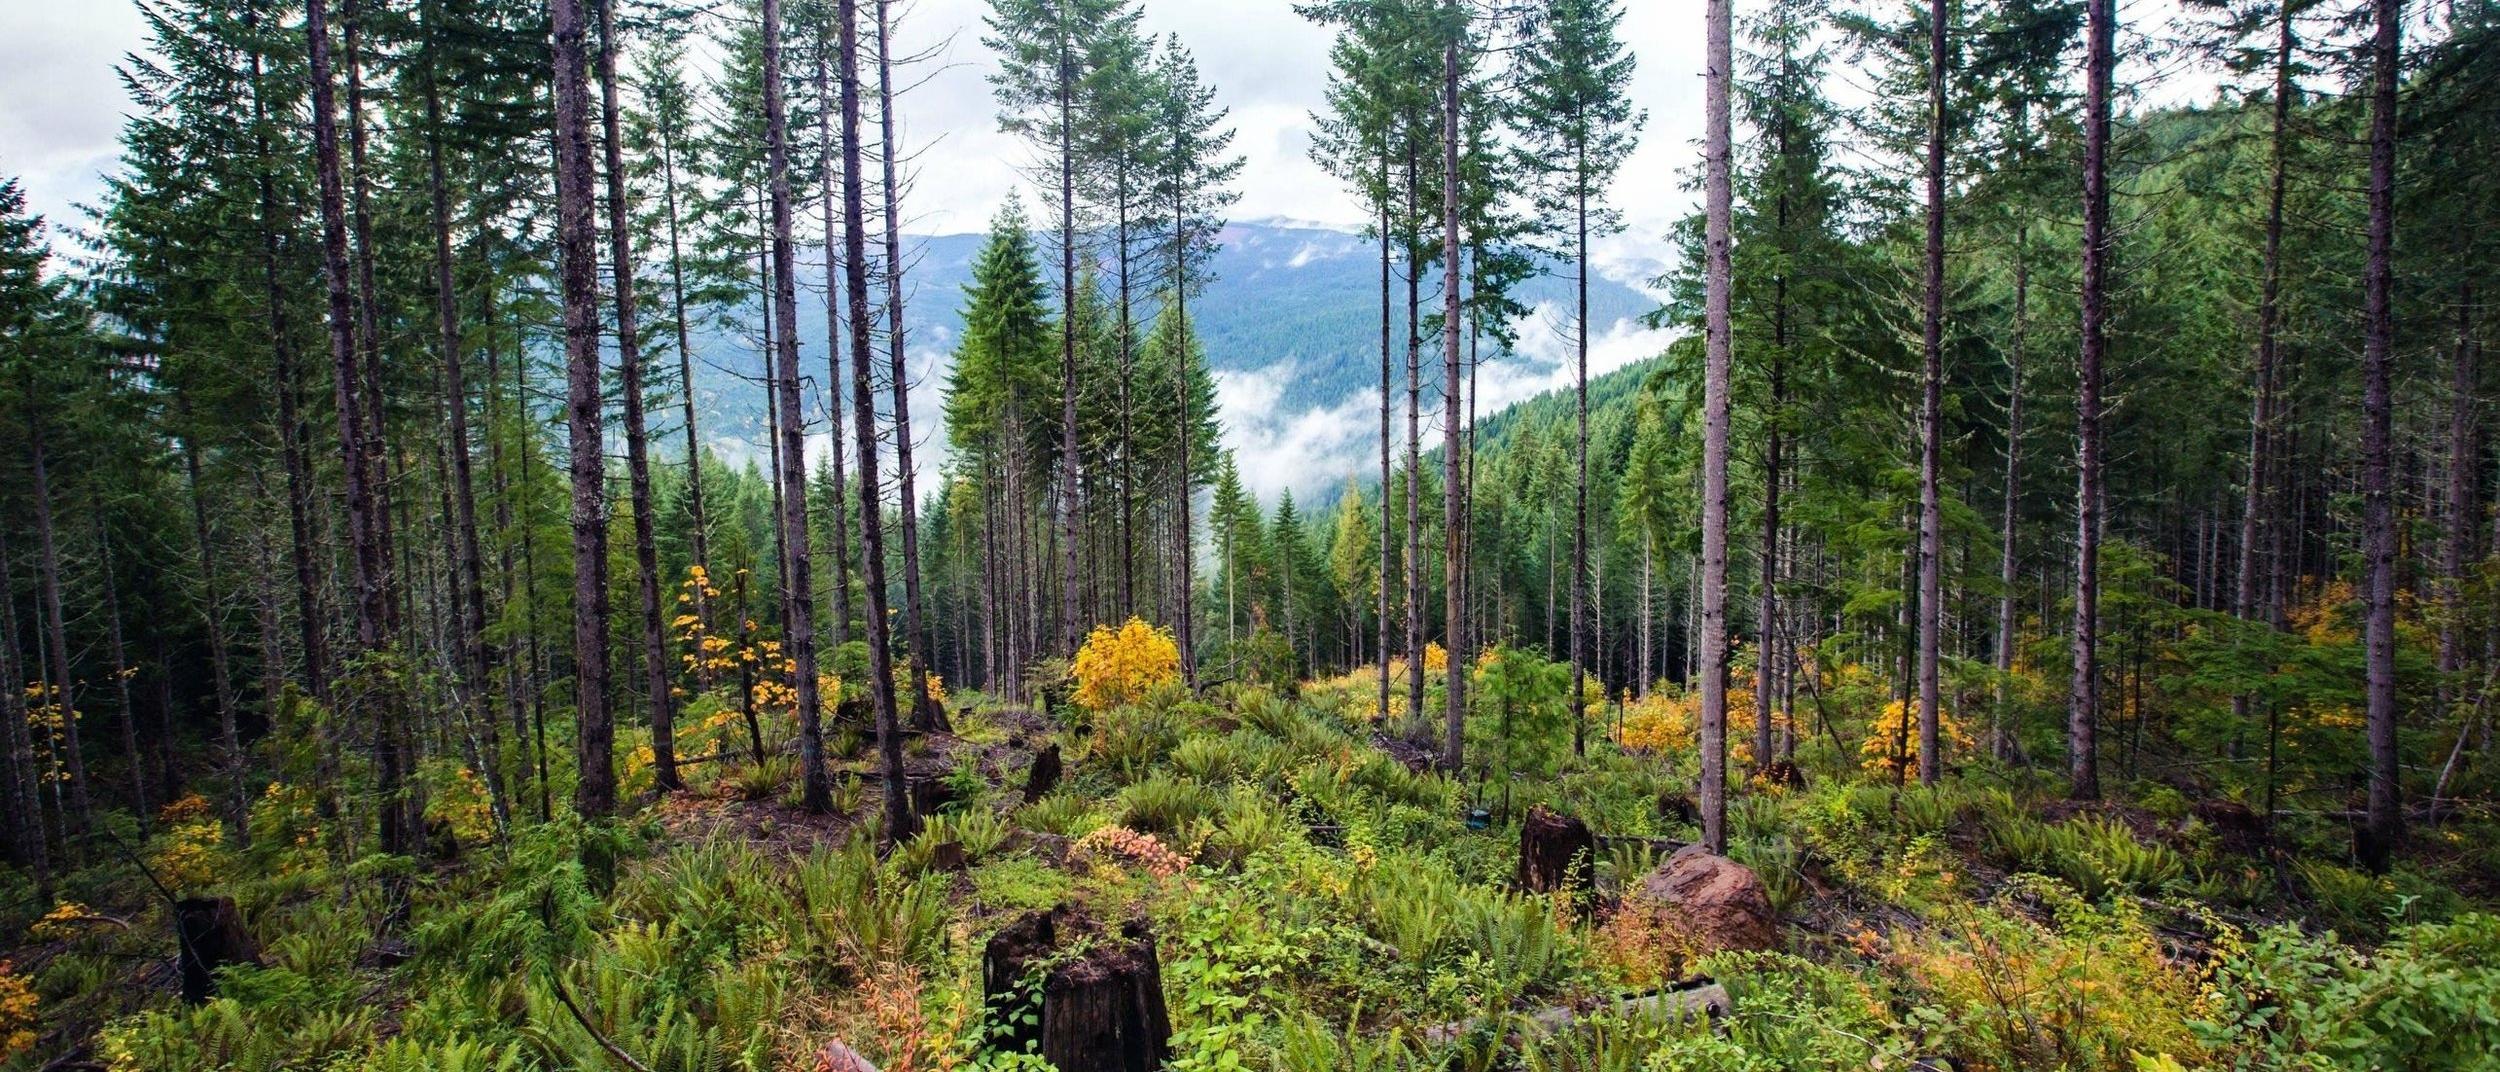 Umpqua National Forest. Photo by Justin Hartney.